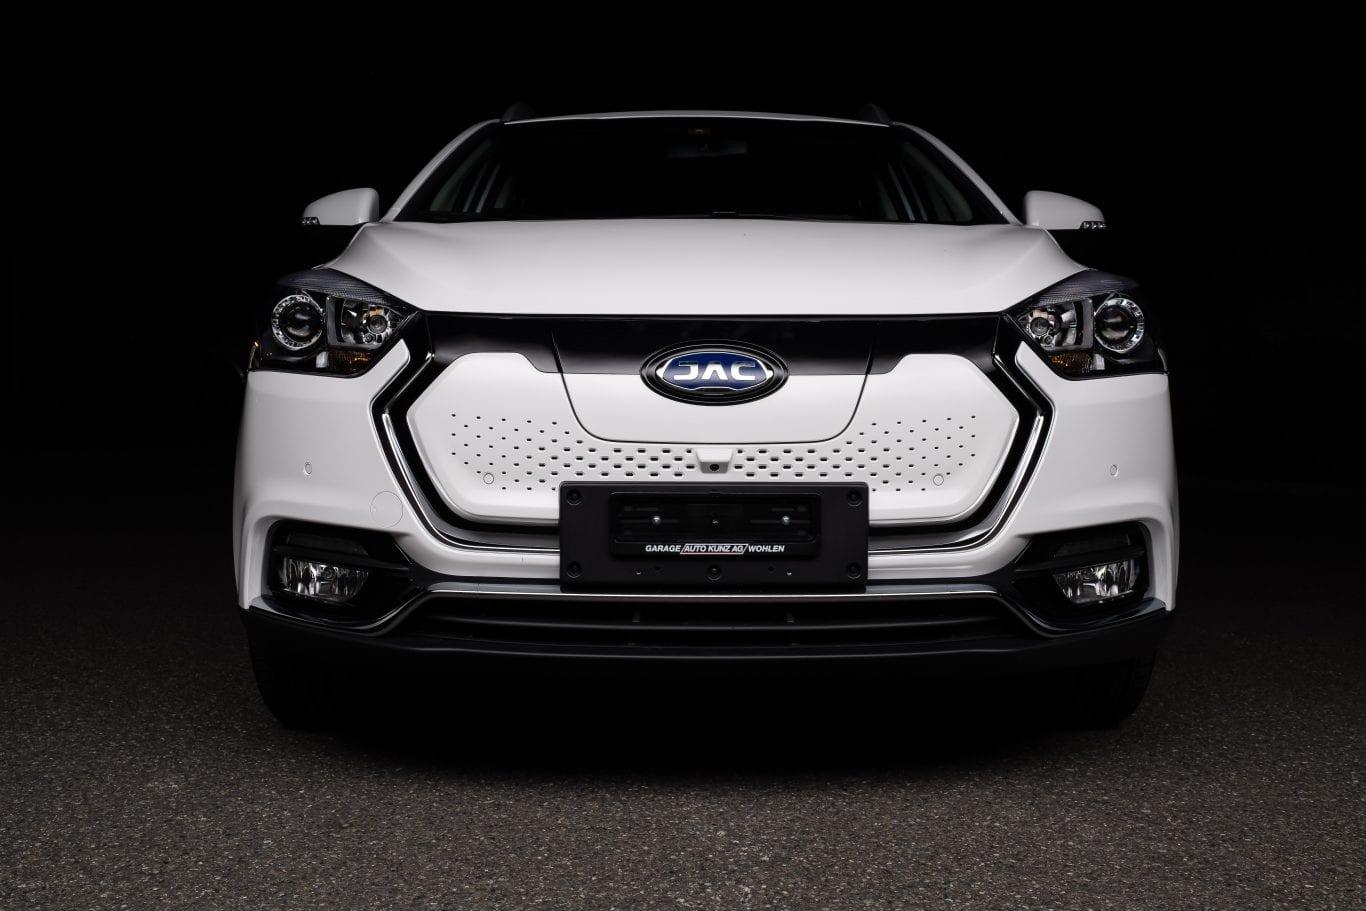 JAC – Auto Kunz ist offiziell neuer Generalimporteur - Auto Kunz AG 9